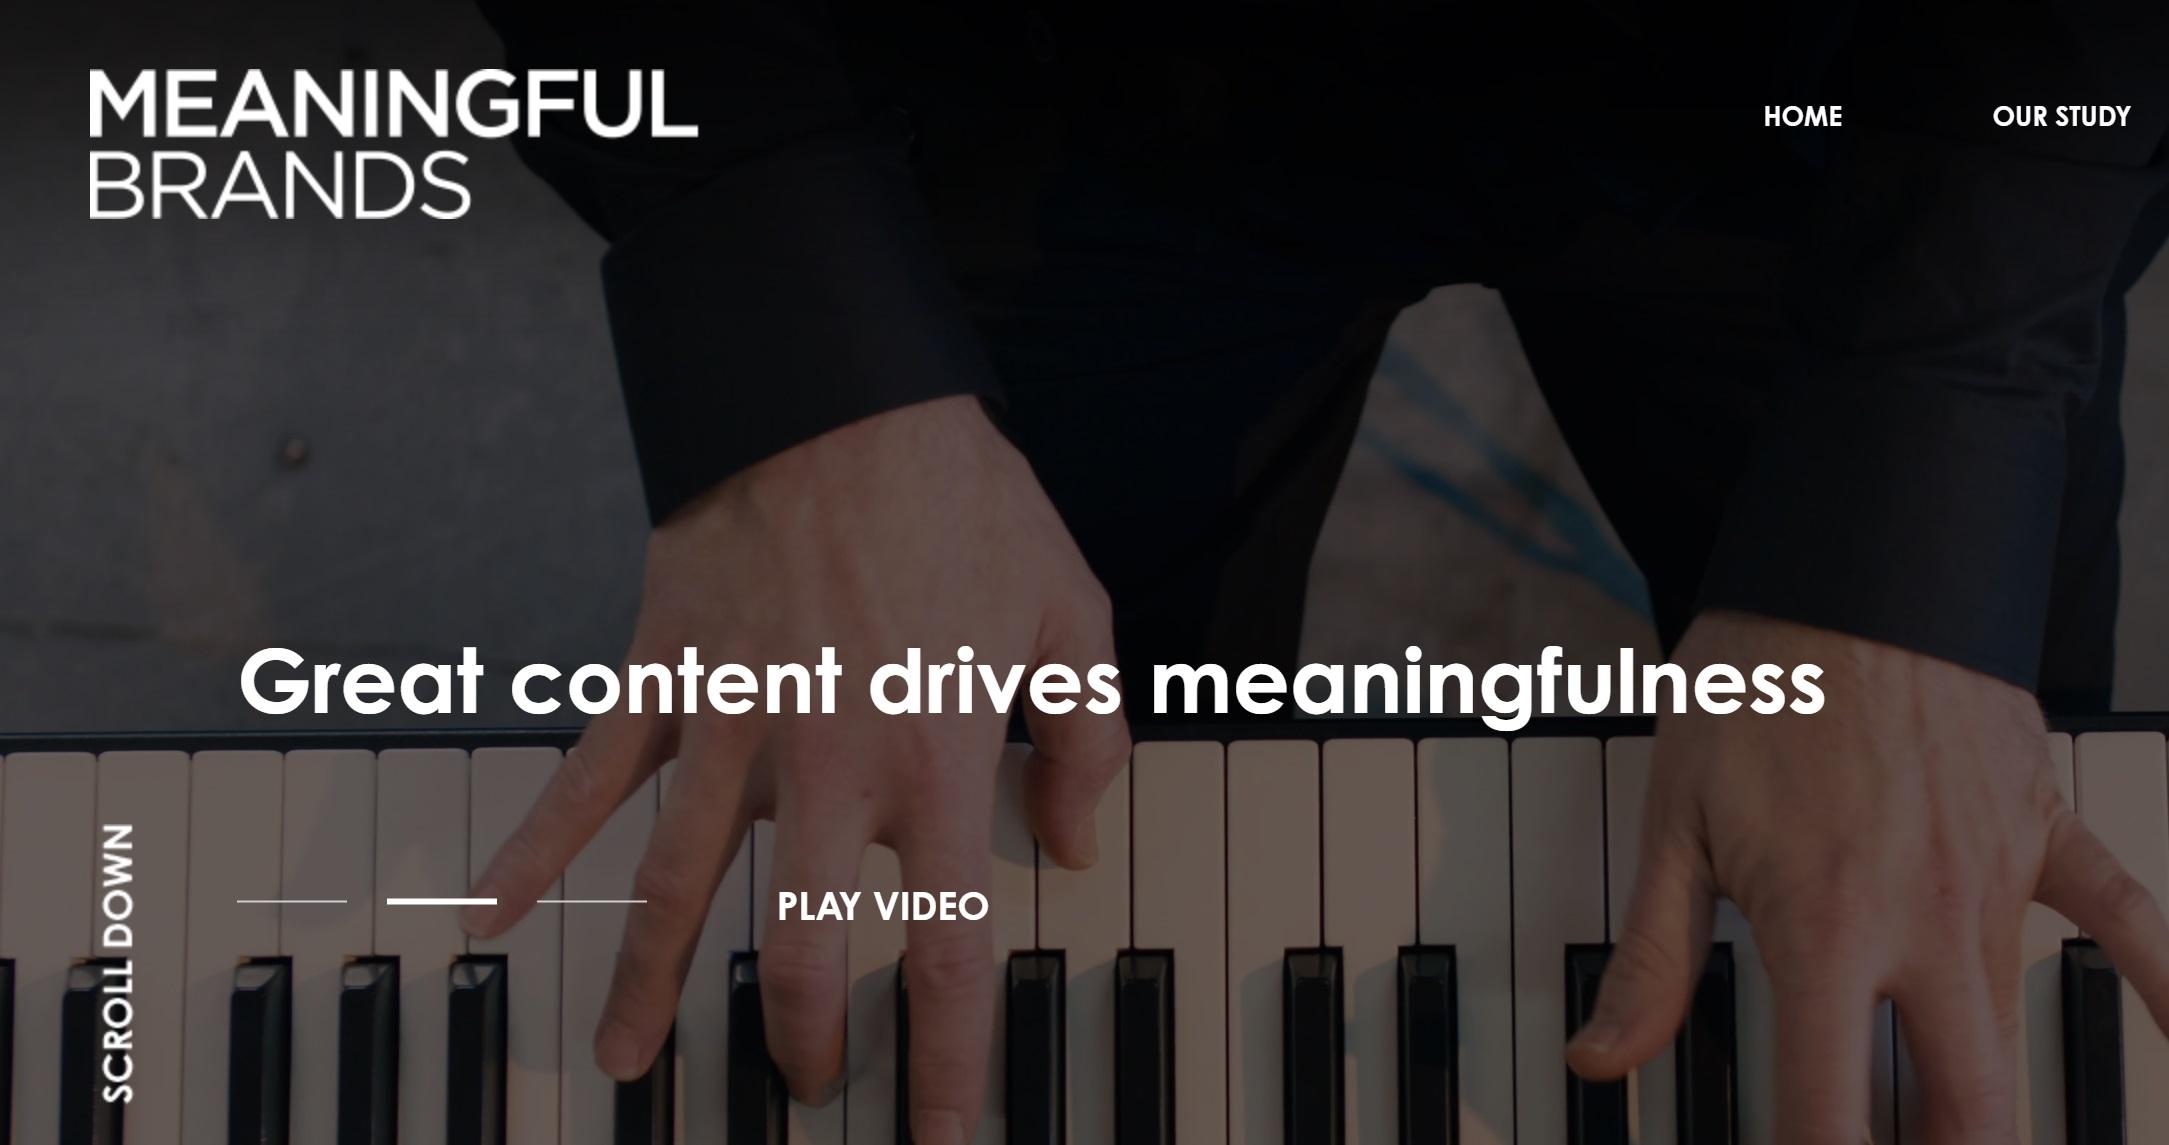 https://www.programapublicidad.com/wp-content/uploads/2019/02/Meaningful-Brands®-2019-programapublicidad-muy-grande.jpg